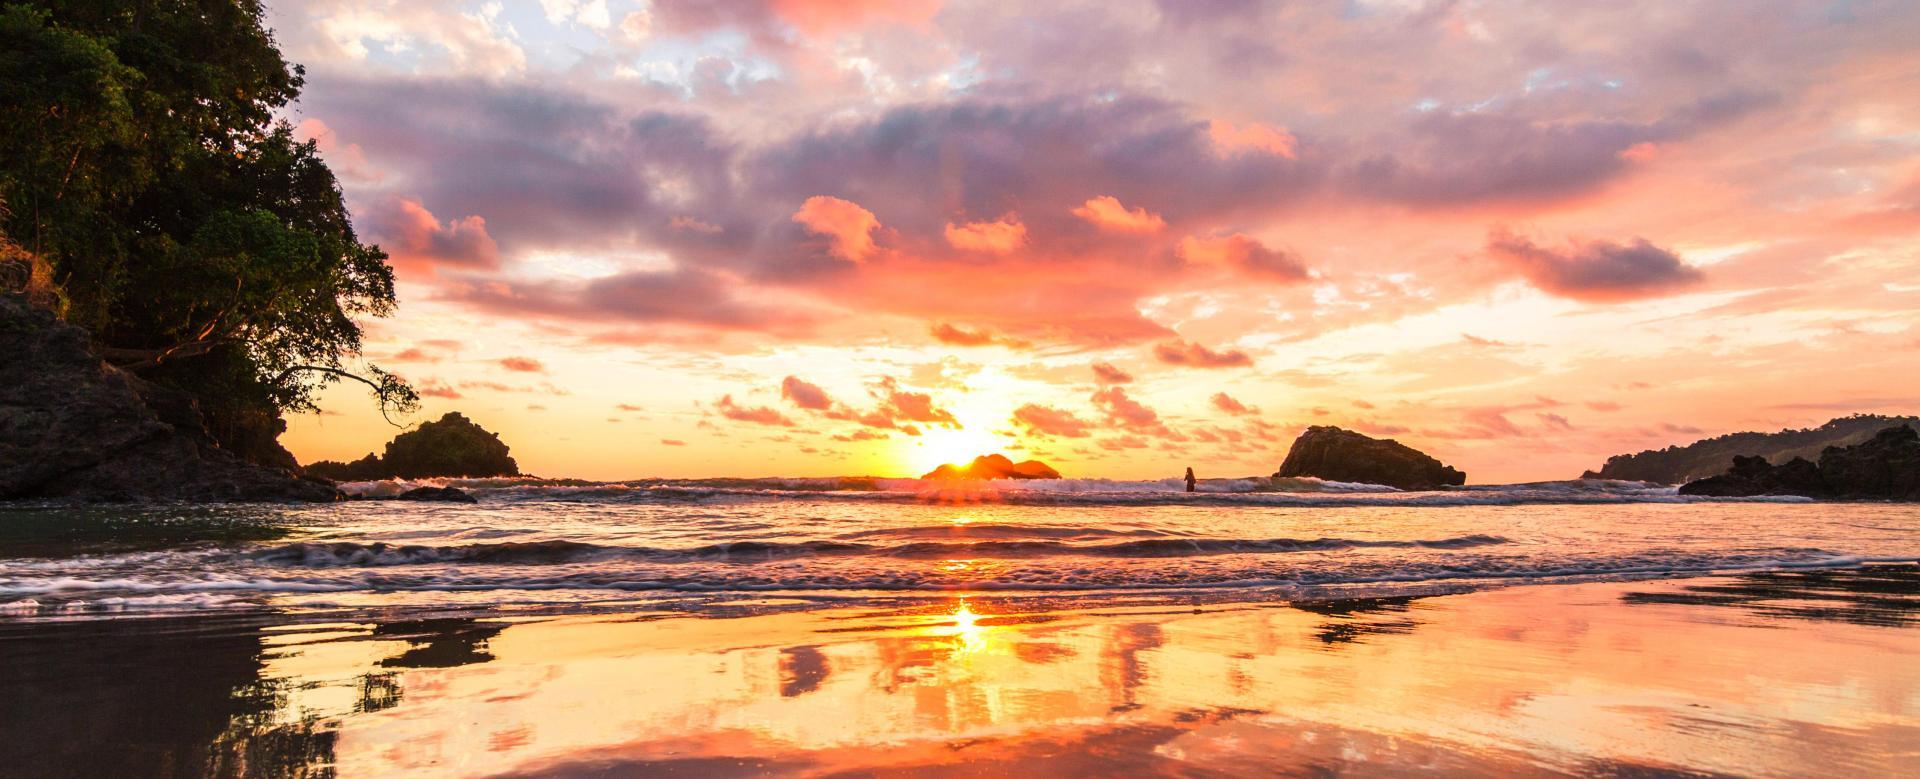 Voyage à pied : Costa Rica : Pura vida, l'éden tropical